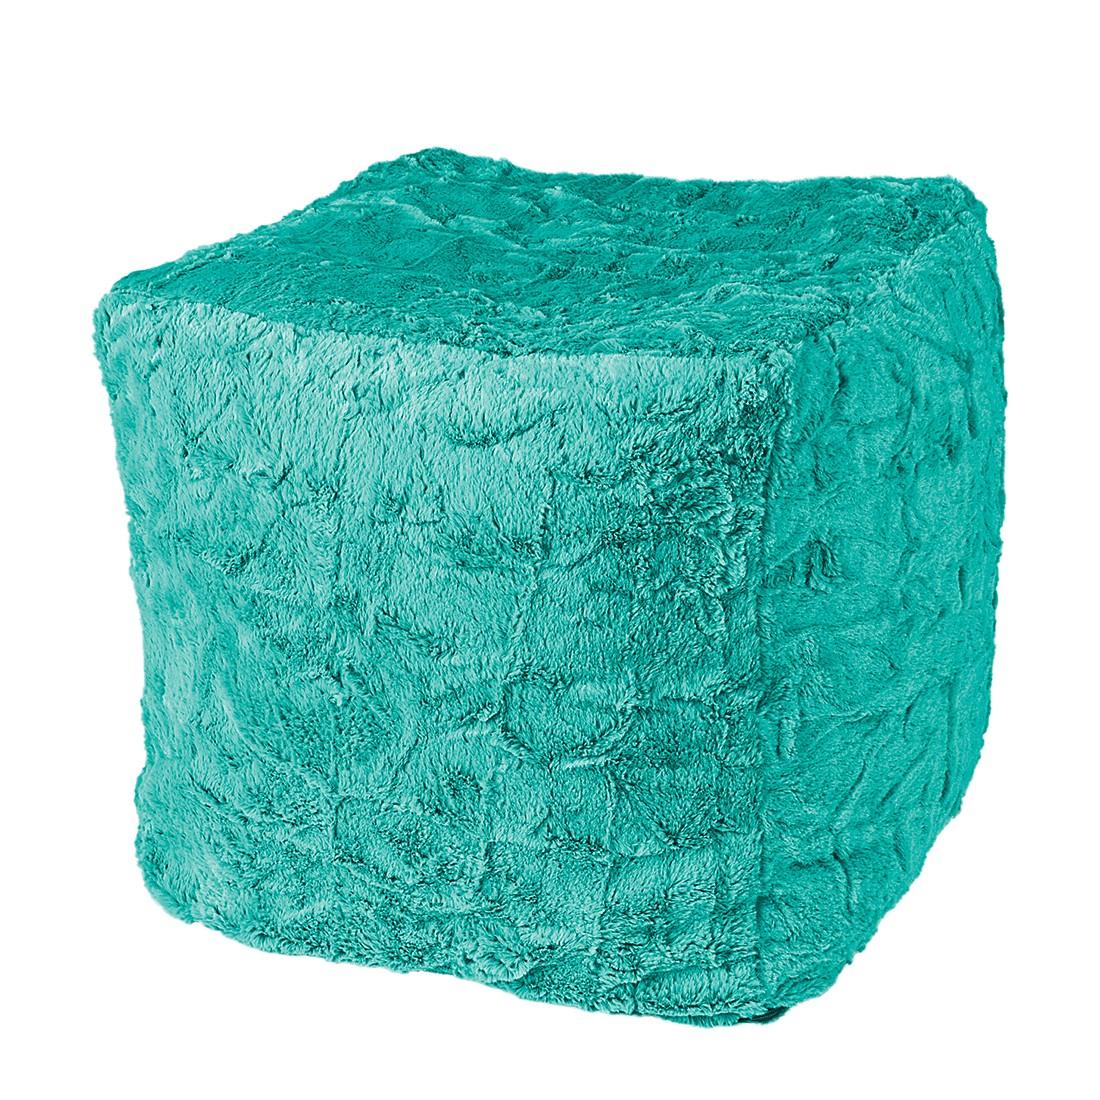 Sitzwürfel Cube Fluffy – Webplüsch – Smaragdgrün, Fredriks günstig bestellen